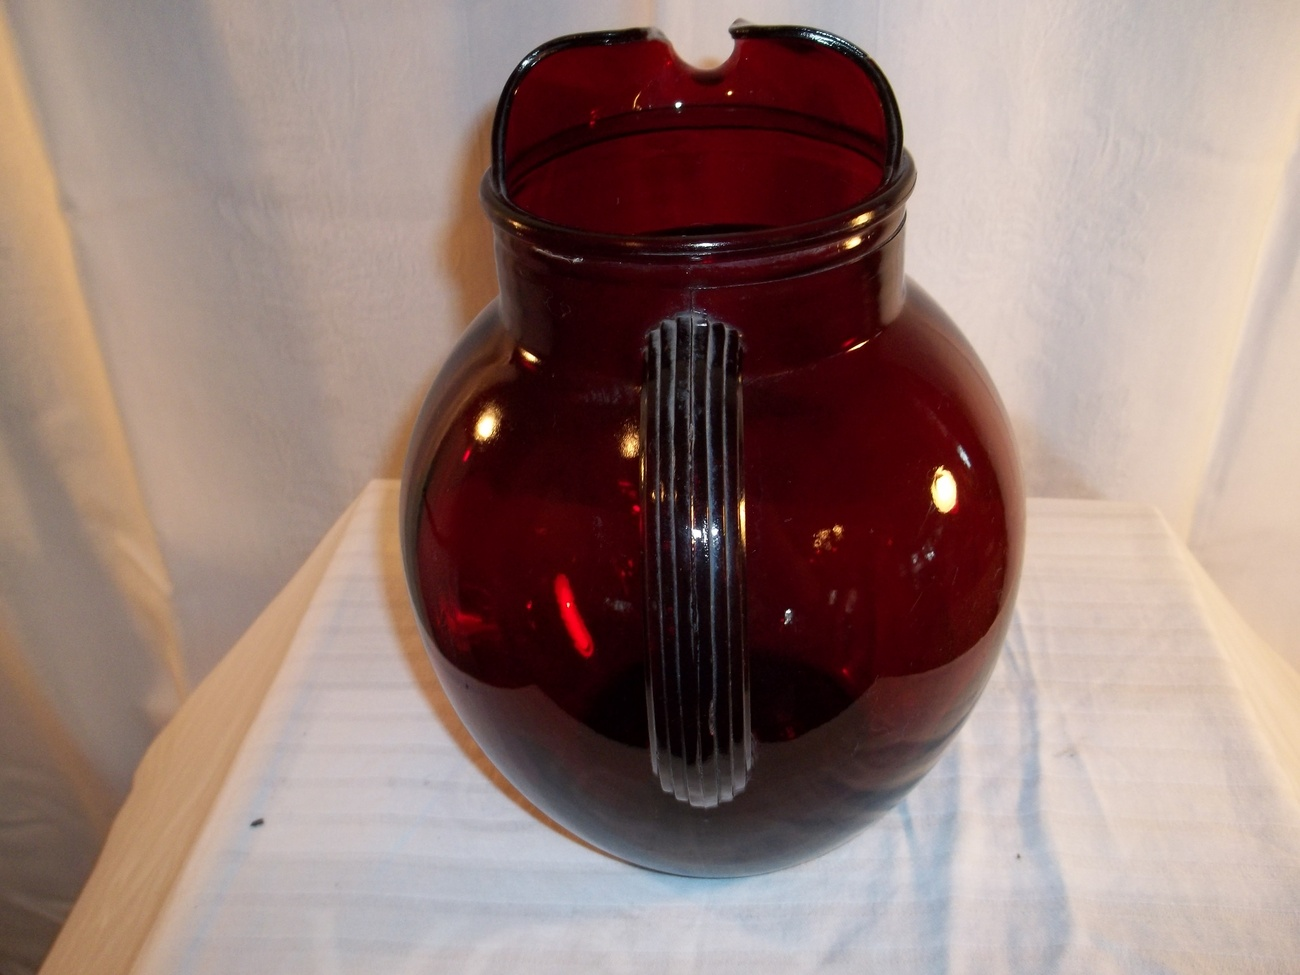 RUBY GLASS BALL PITCHER